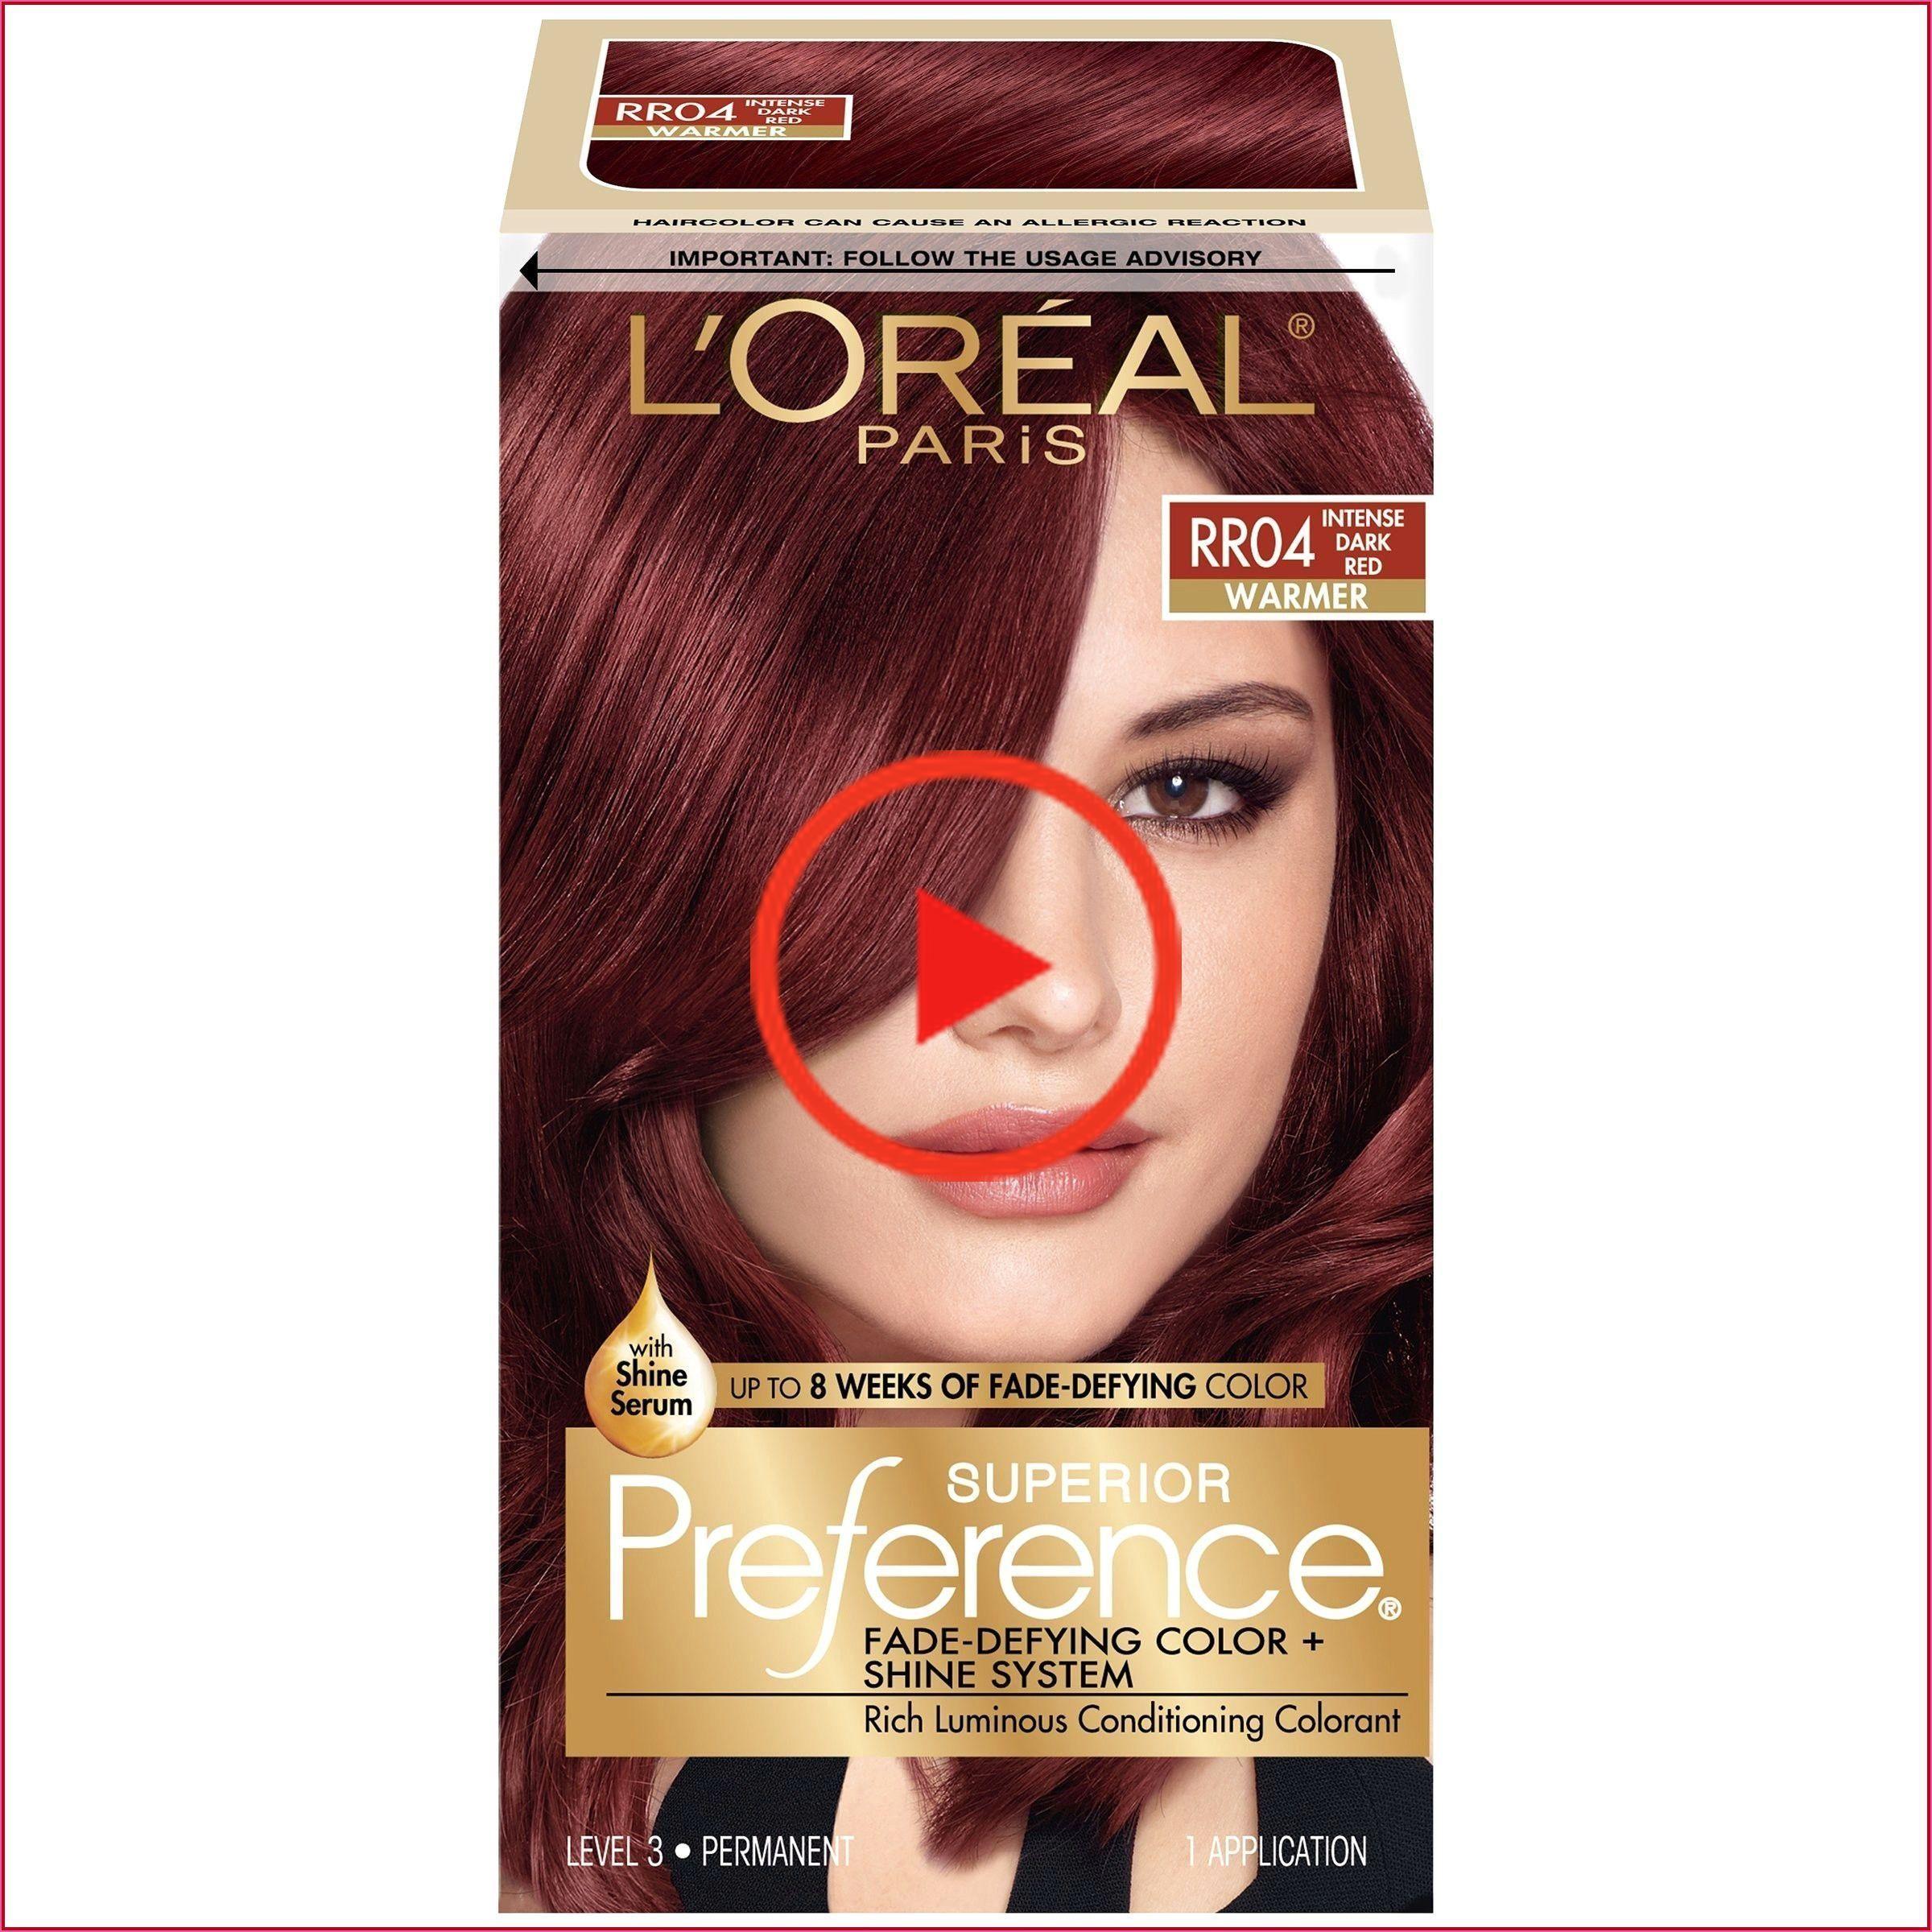 Loreal Preference Hair Color Chart Loreal Preference Hair Color Chart Loreal Preference Hair In 2020 Loreal Preference Hair Color Hair Color Chart Loreal Hair Color